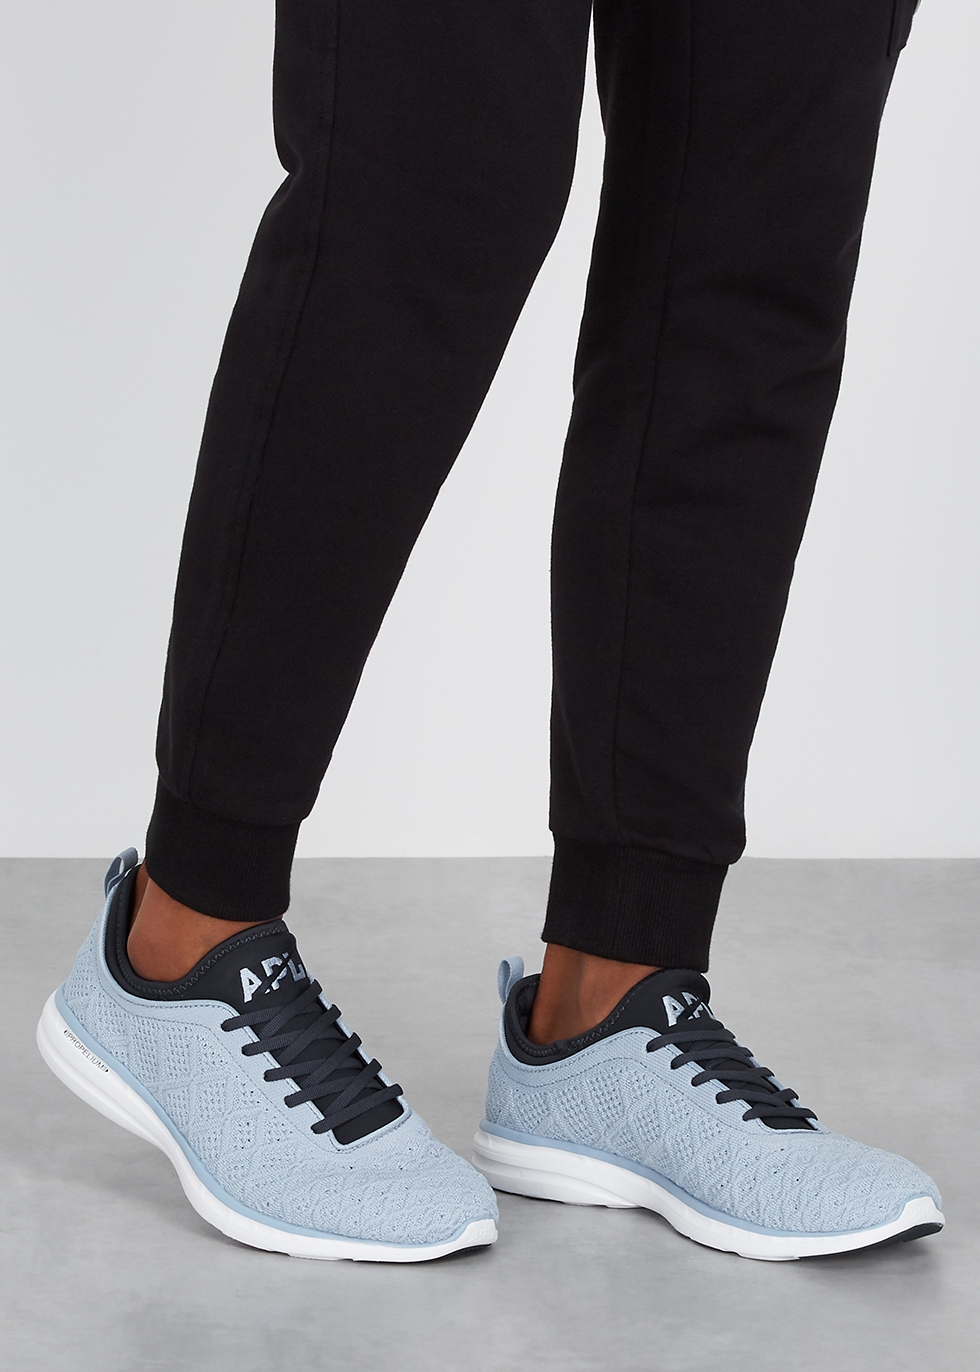 affbde71e Men's Designer Shoes - Men's Footwear - Harvey Nichols